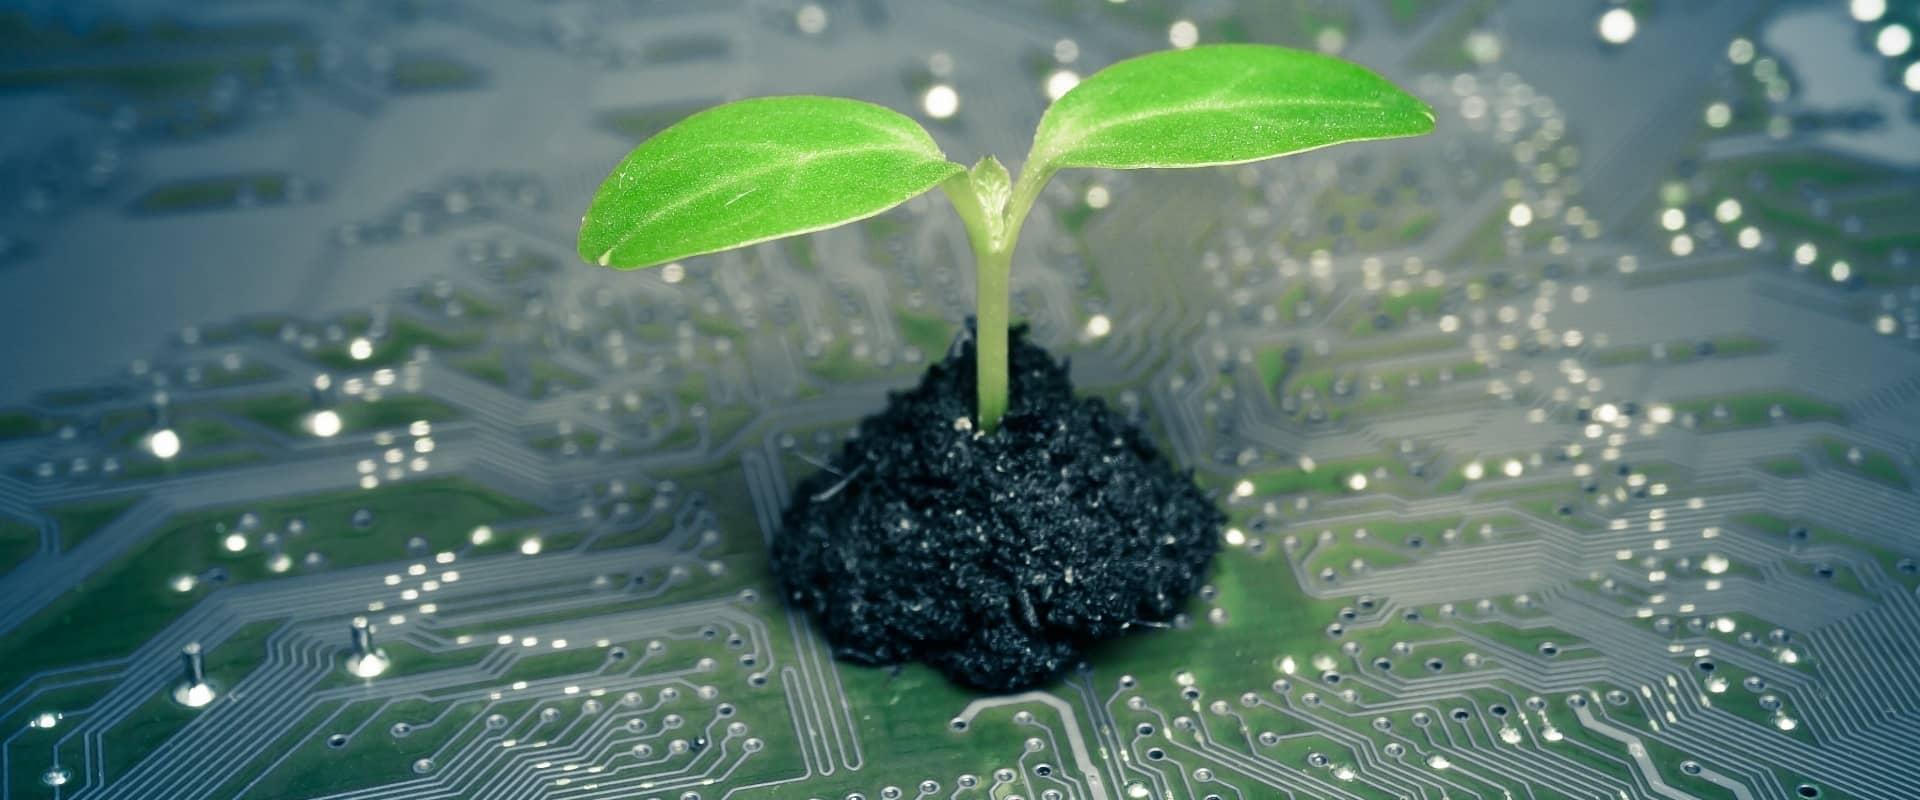 greentech-ruhr-background-banner.jpg